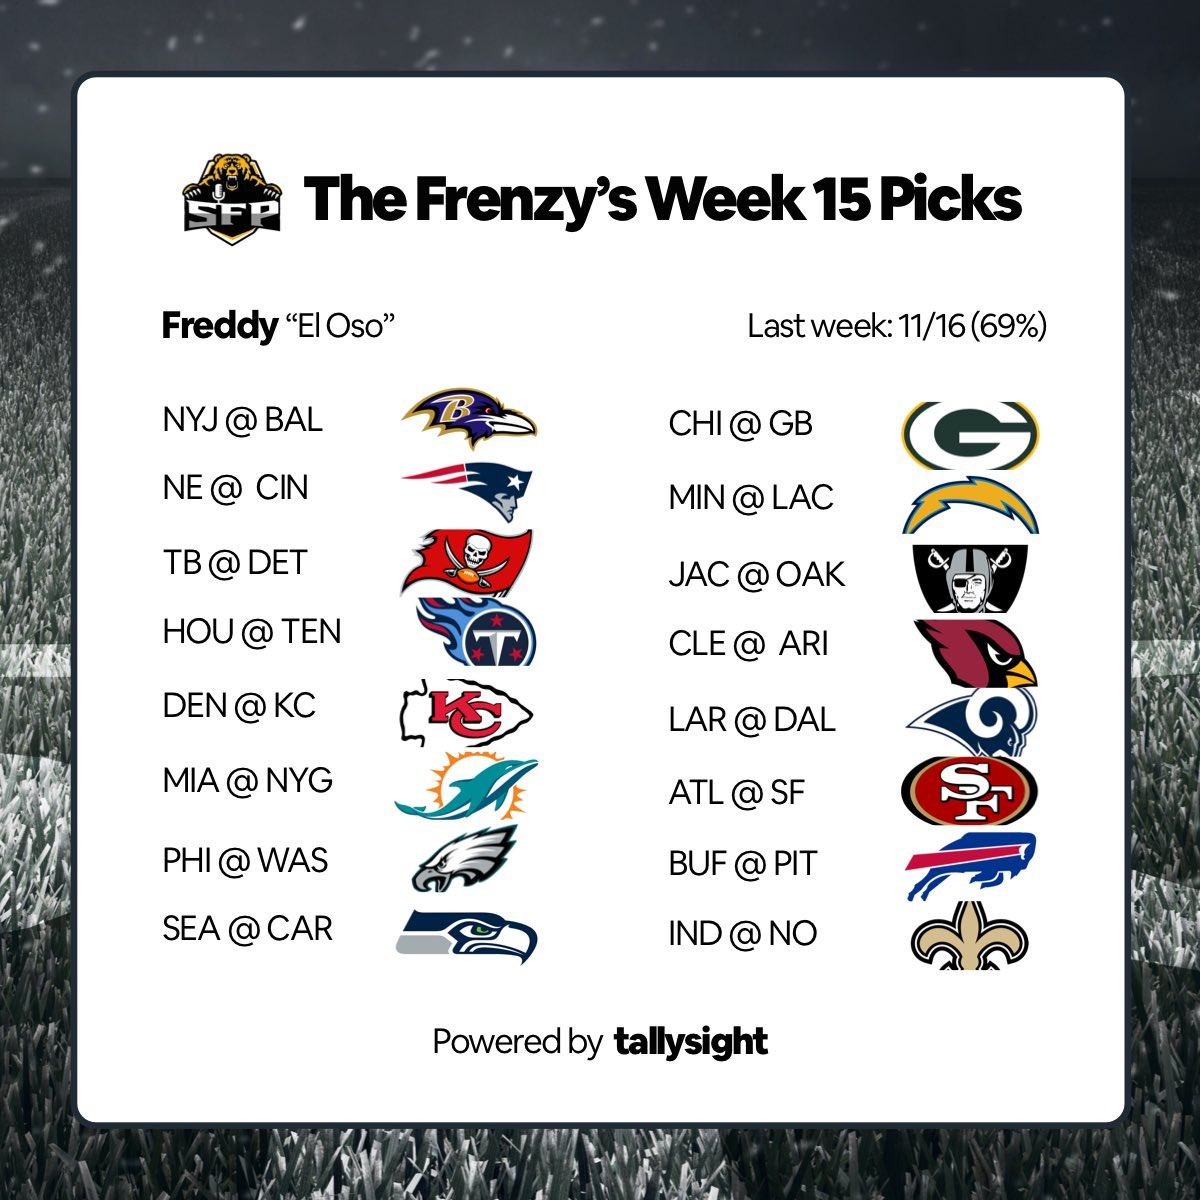 El OSO's picks for week 15 powered by our great friends @tallysight #nfl #nflfootball #football #nflweek15 #sport #sports #newyork #ny #picks #nflpicks #jointhefrenzy #feedthefrenzypic.twitter.com/Pom7yprqbI